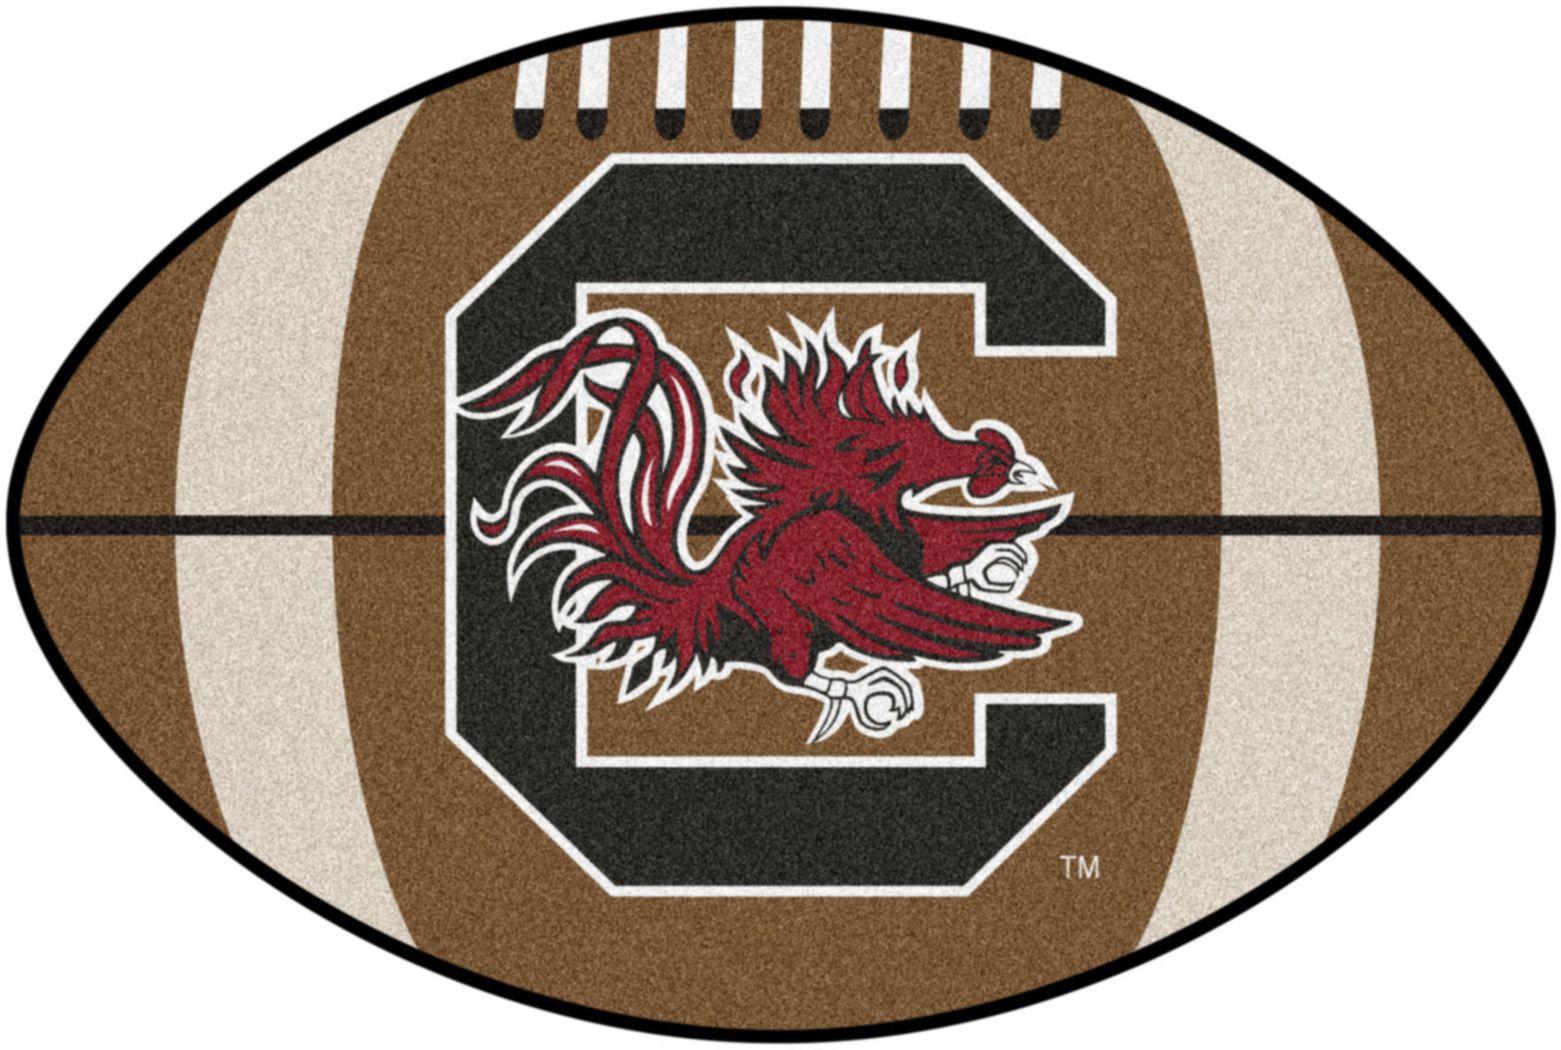 "NCAA Football Mascot University of South Carolina 1'6"" x 1'10"" Rug"